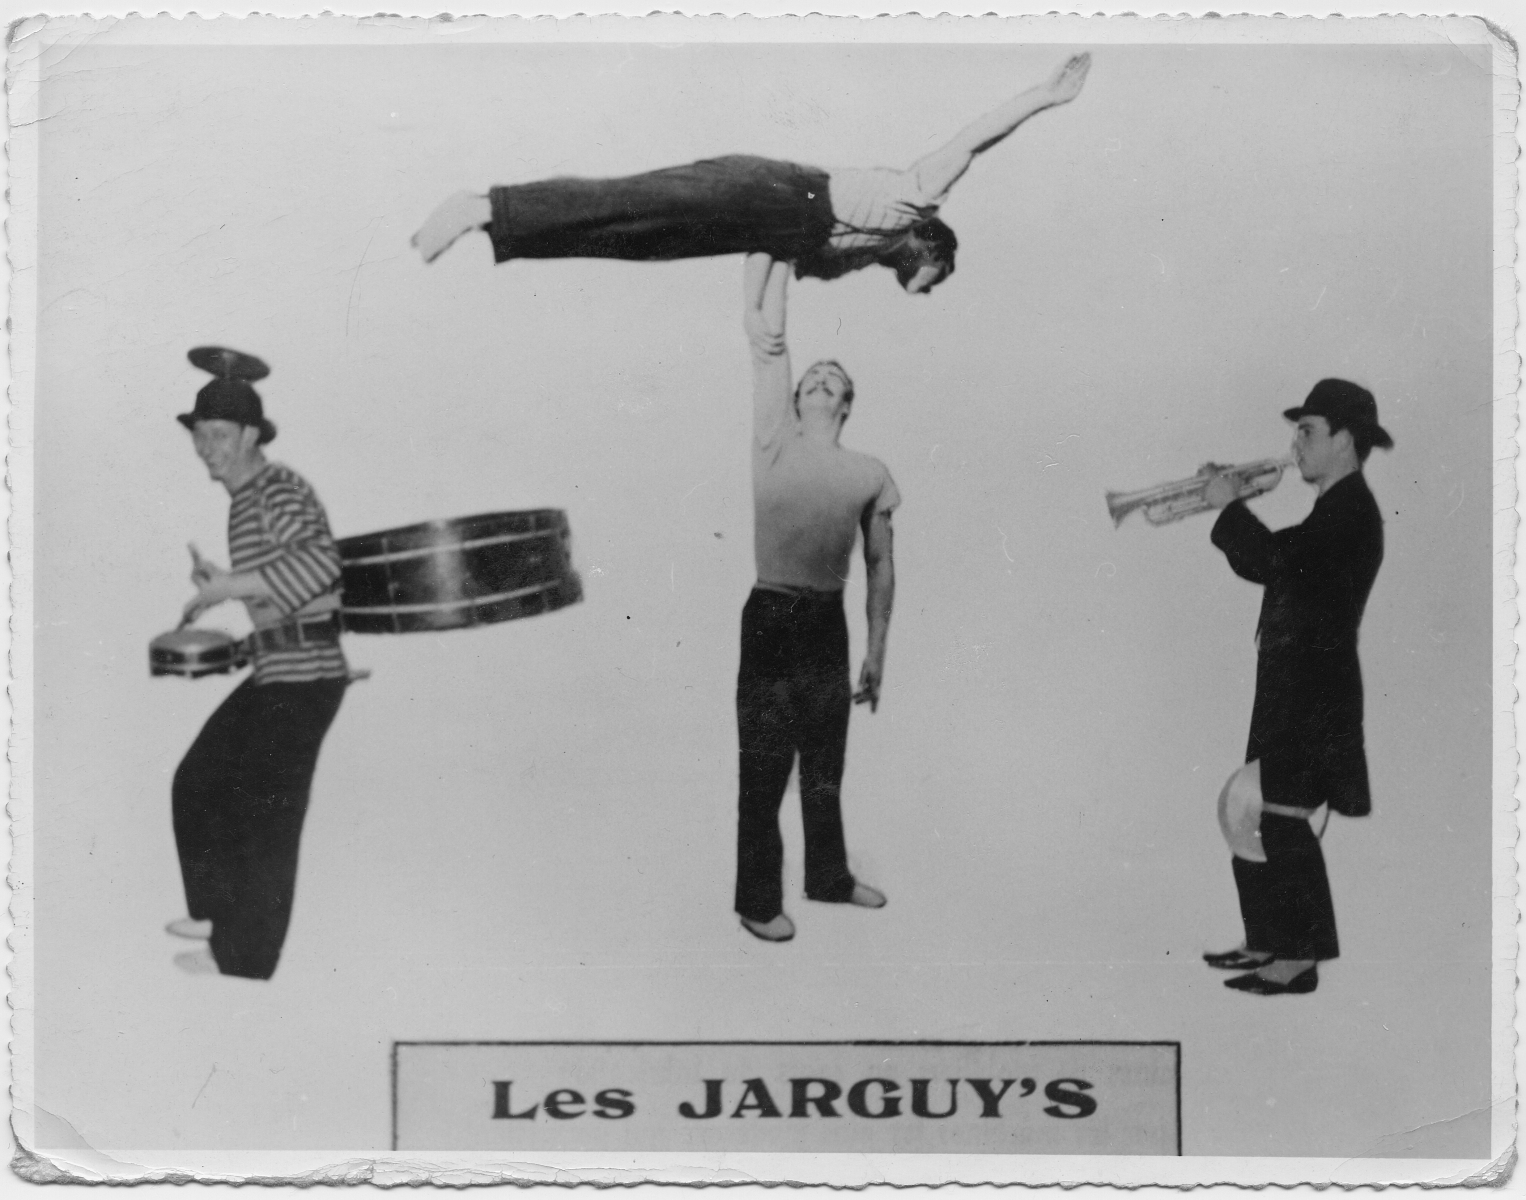 Les-Jarguys-1-GC